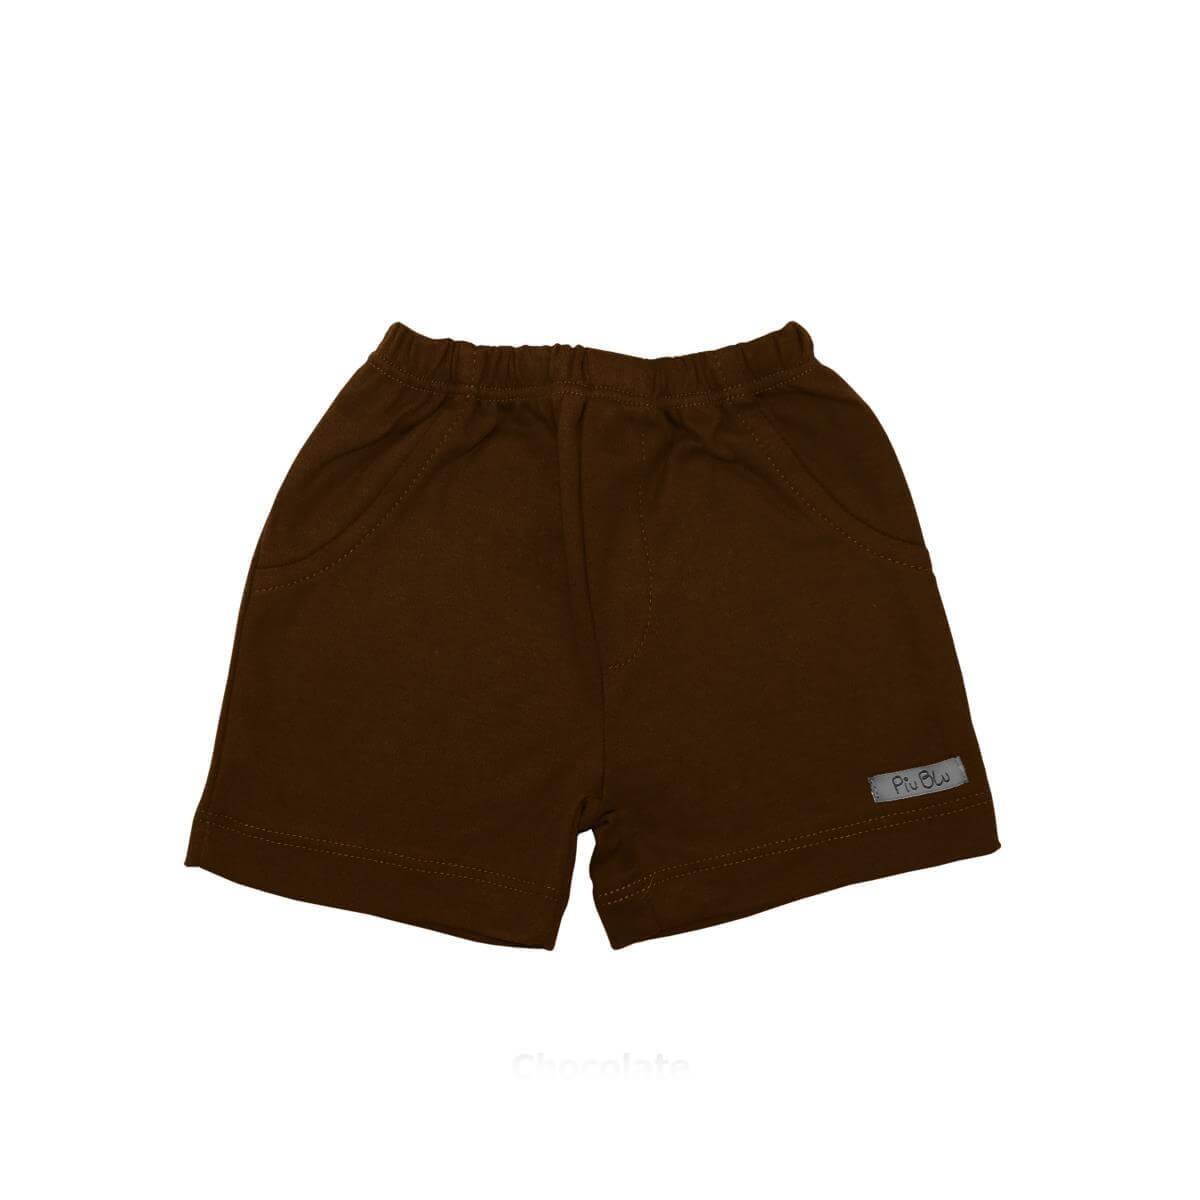 Shorts Masculino 1 ao 4 Chocolate